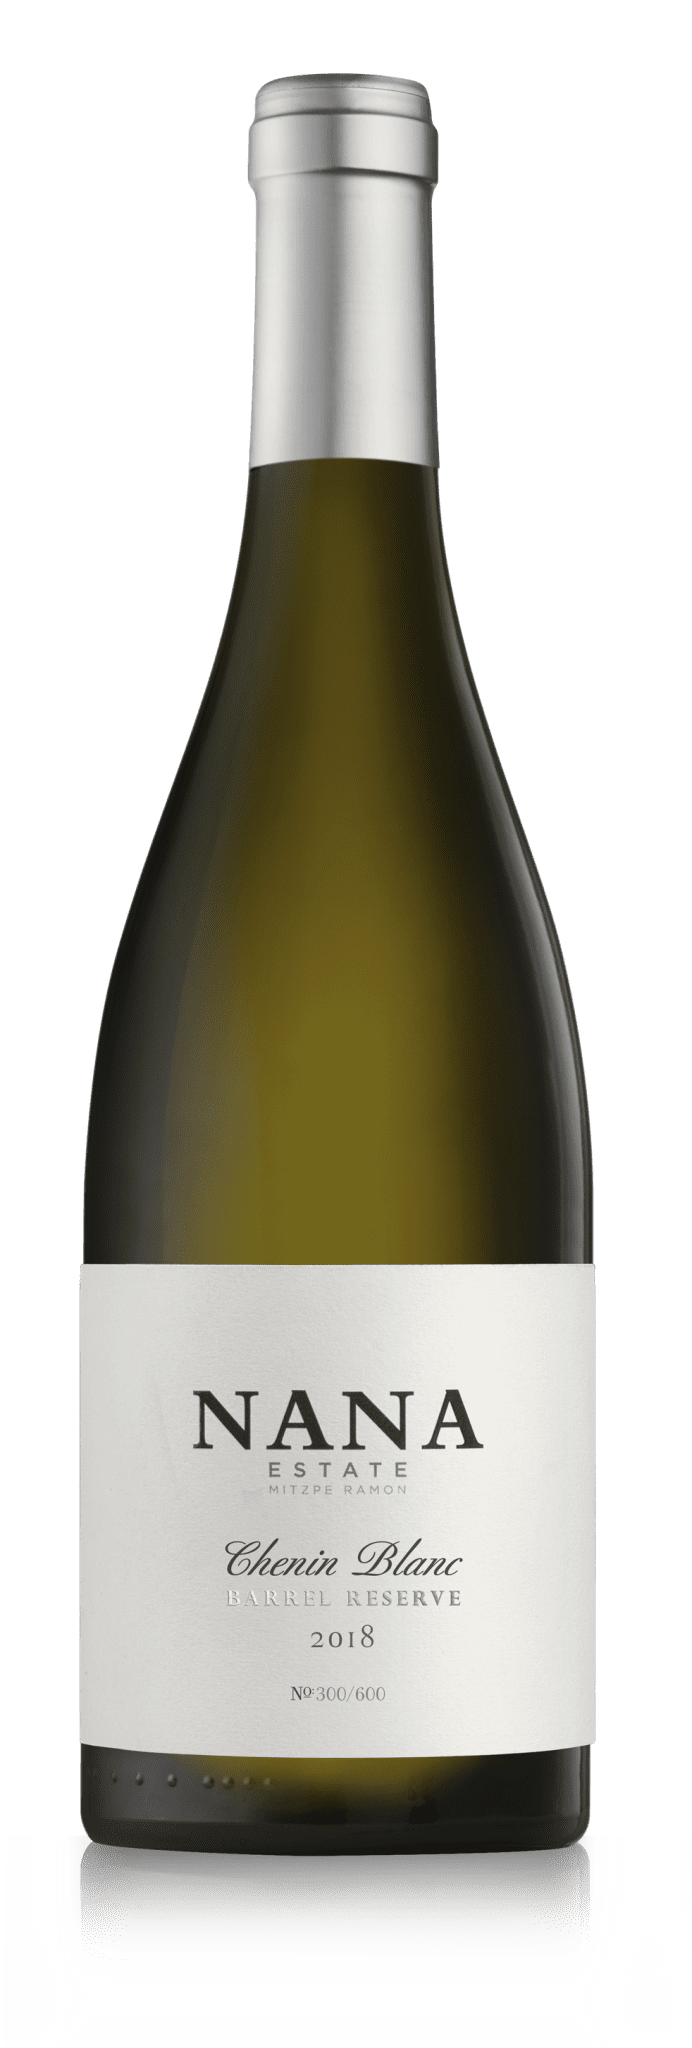 Chenin Blanc | Barrel Reserve